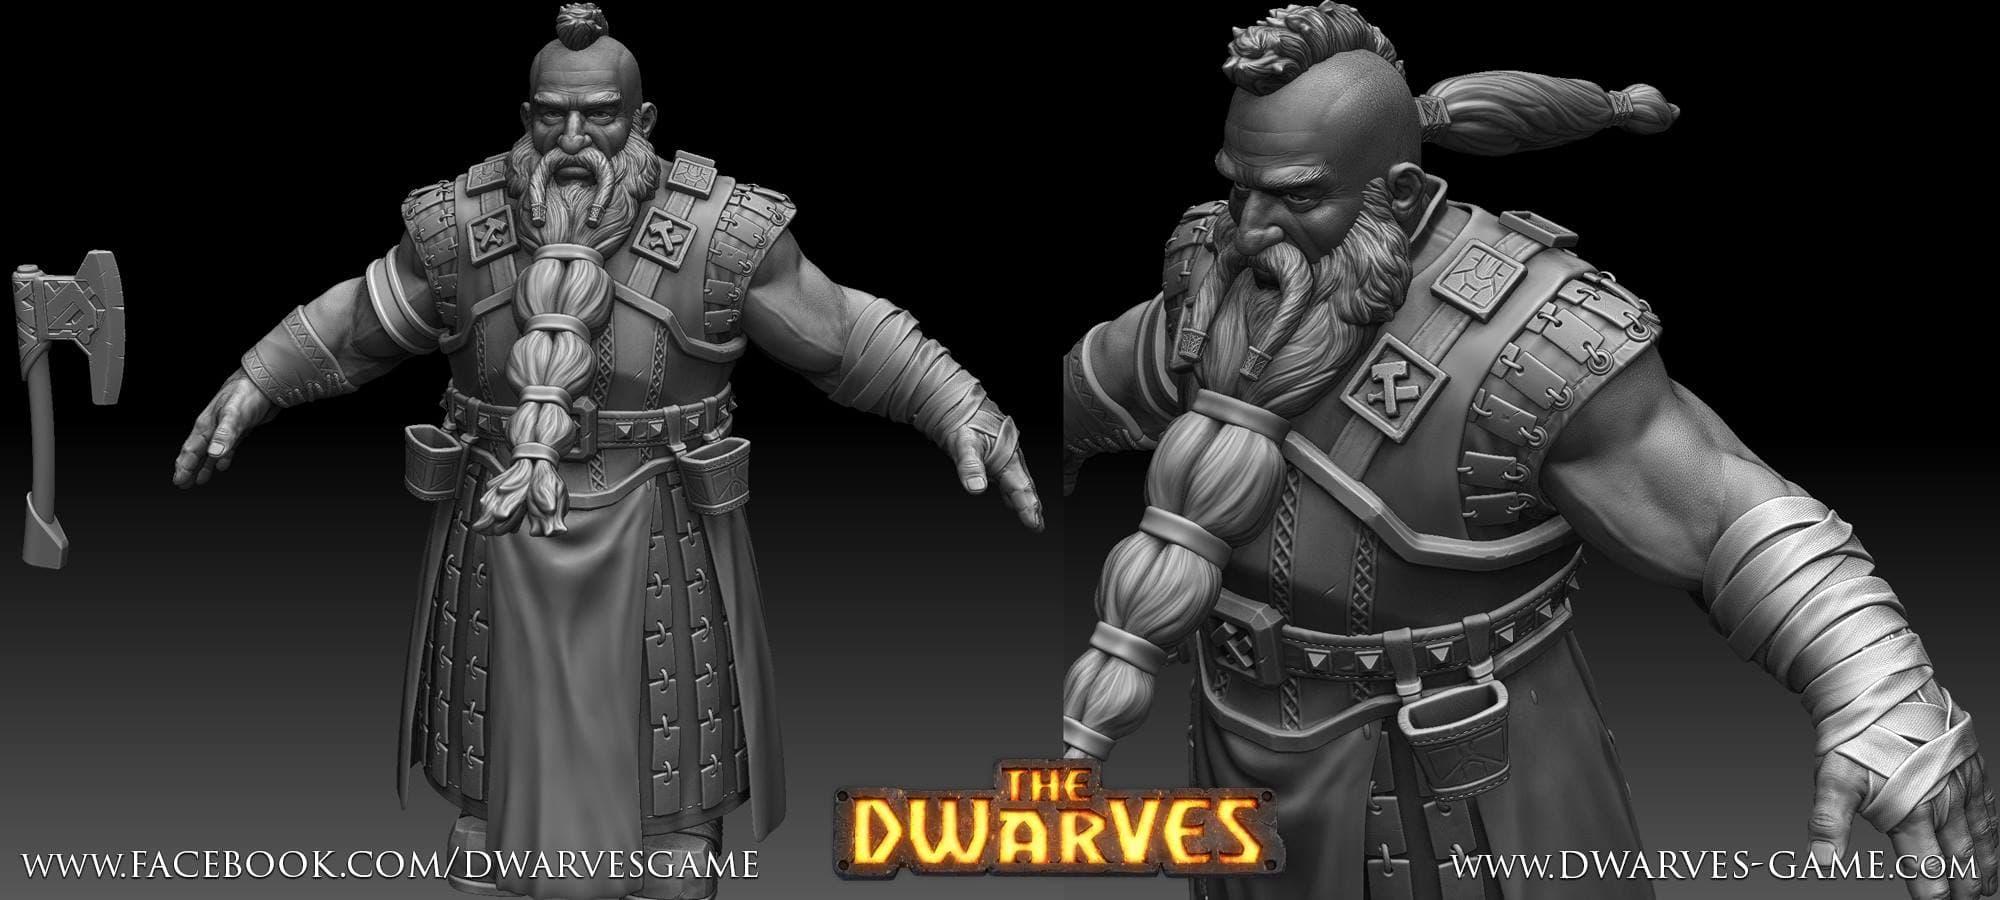 The Dwarves Xbox